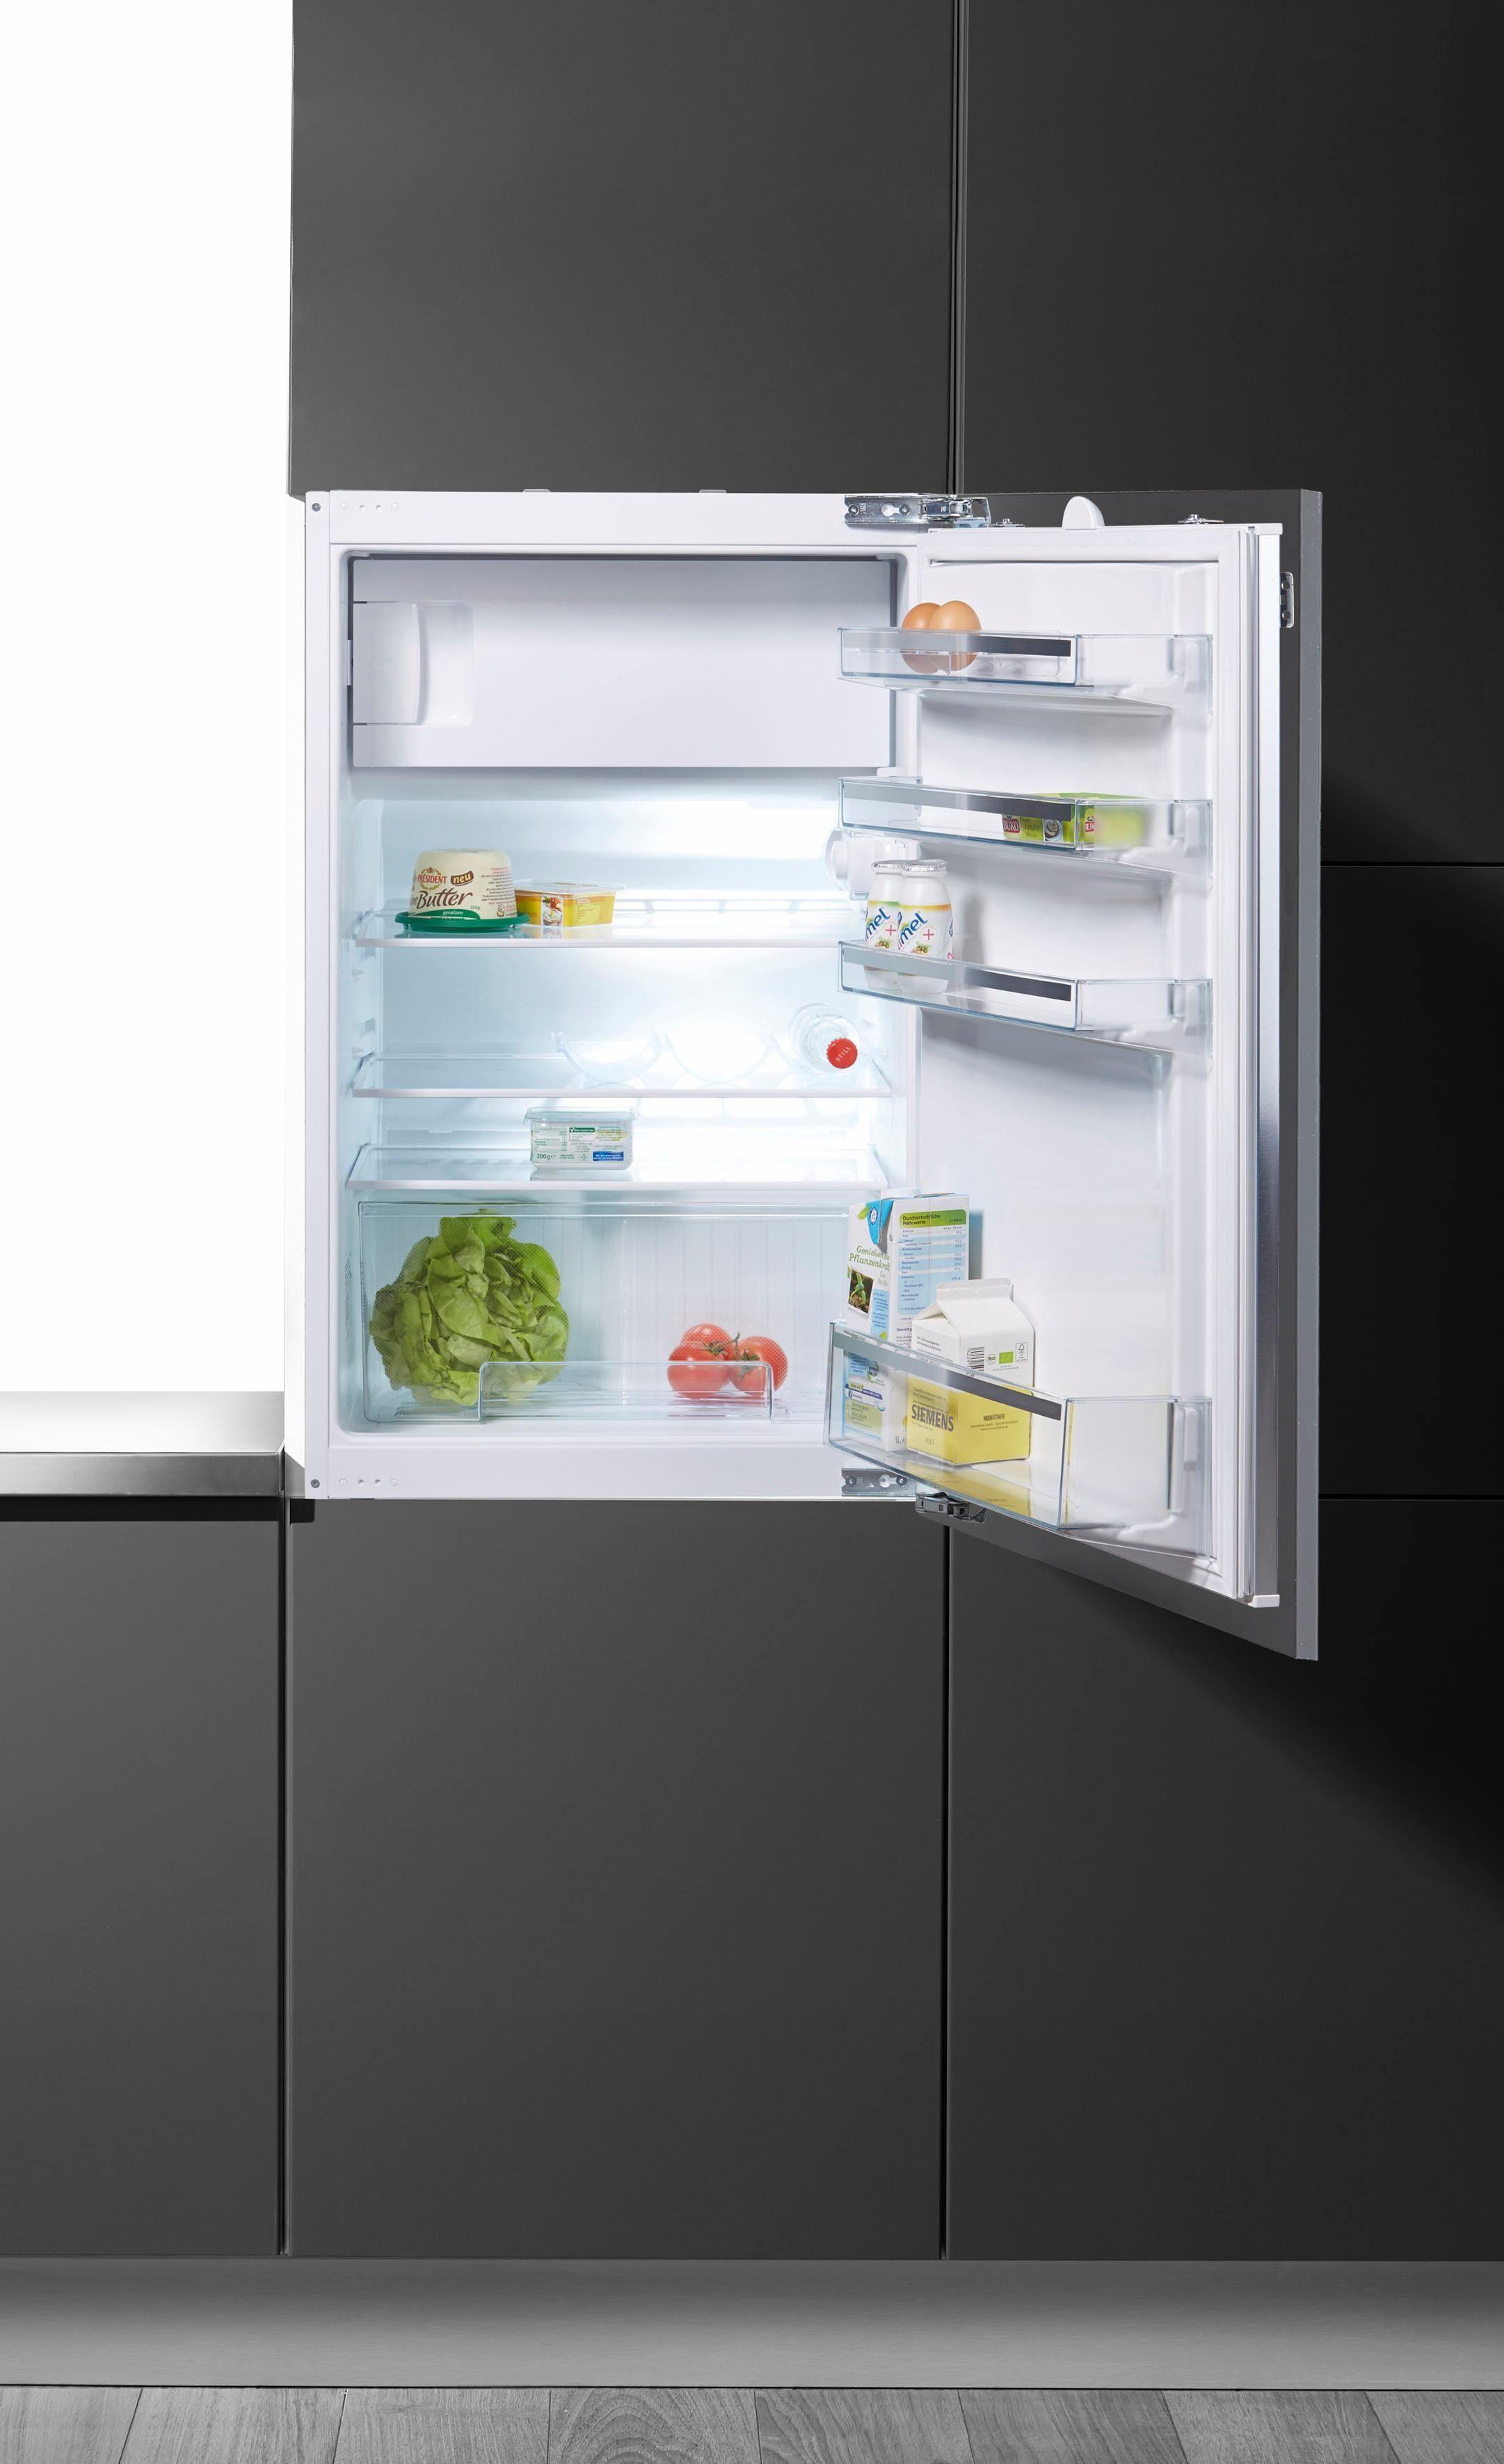 SIEMENS Einbaukühlschrank KI18LV52, 87,4 cm hoch, 54,1 cm breit